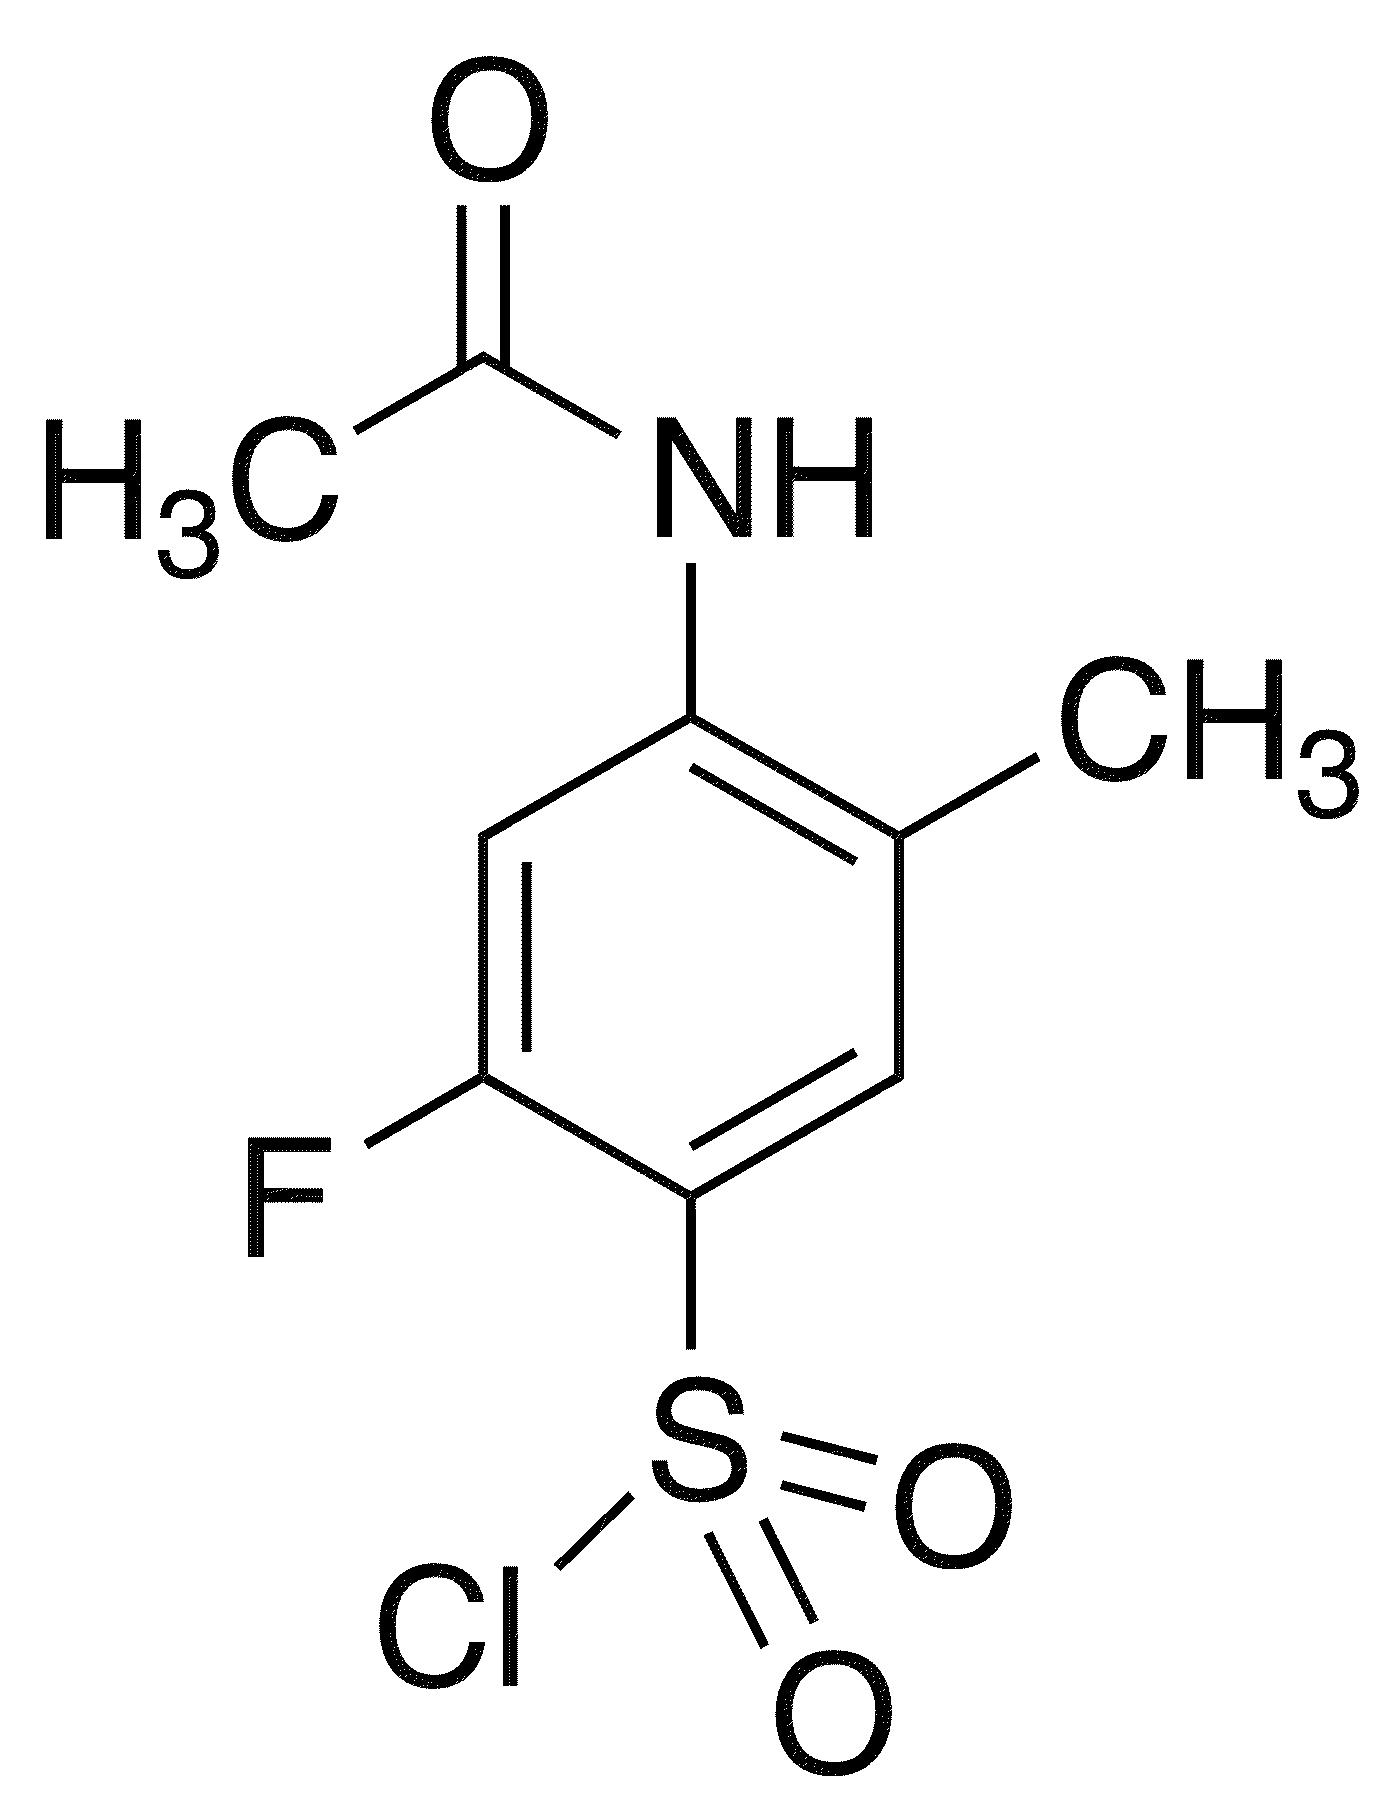 4-Acetamido-2-fluoro-5-methylbenzenesulfonyl chloride